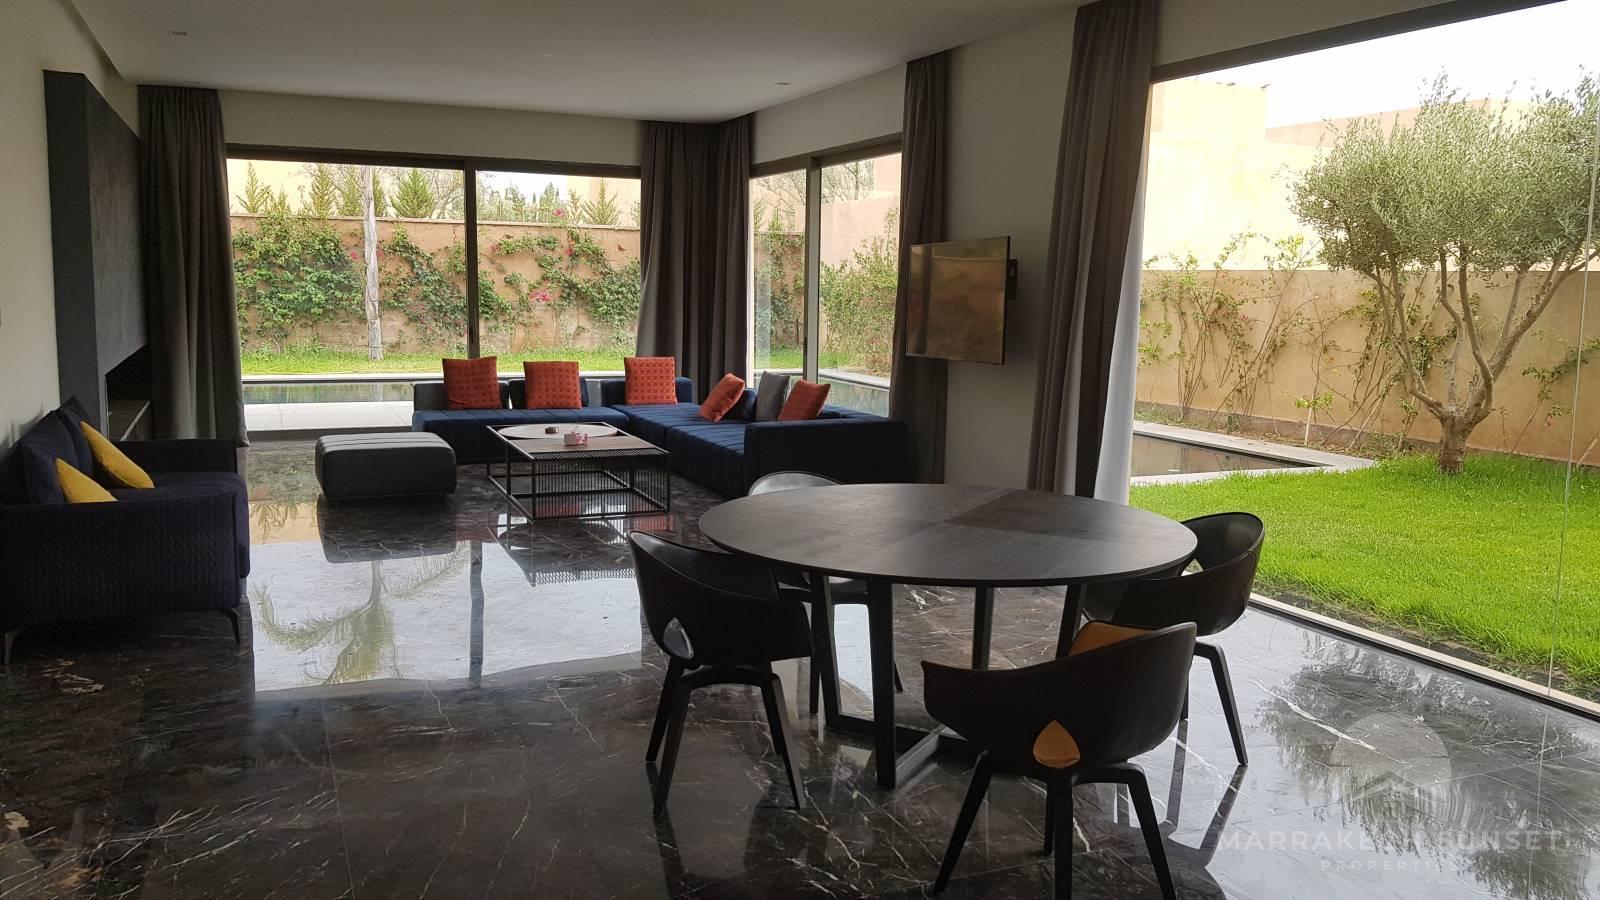 4 bedroom Luxury villa for sale in a private domain Marrakech